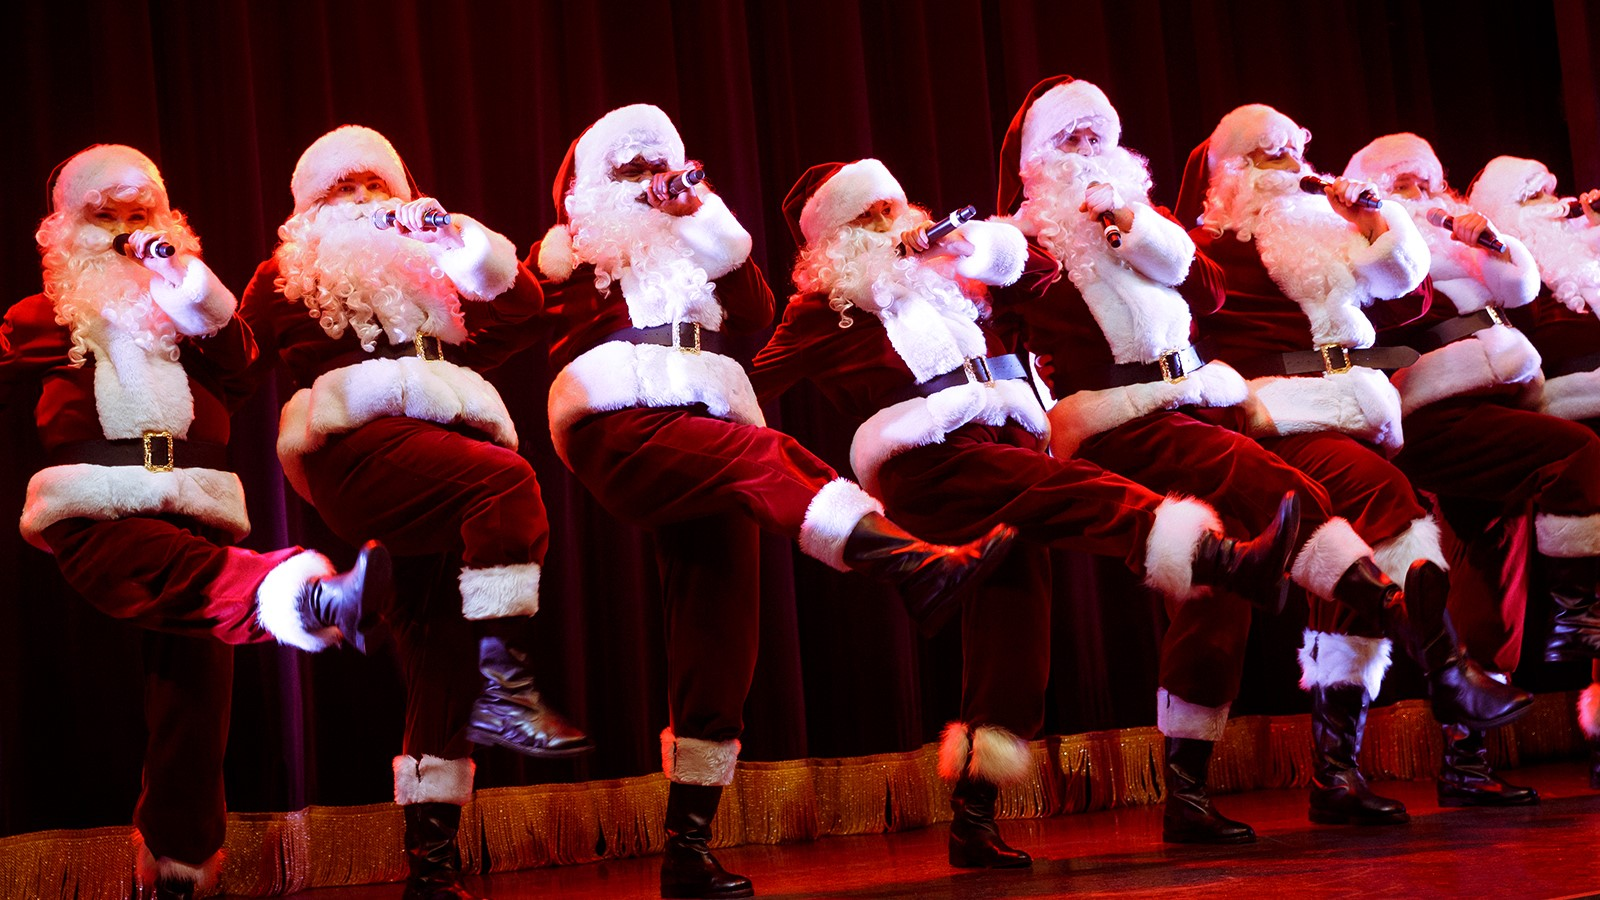 Det vildeste show: Kom til legendarisk julefest med Wallmans Christmas Show i AKKC